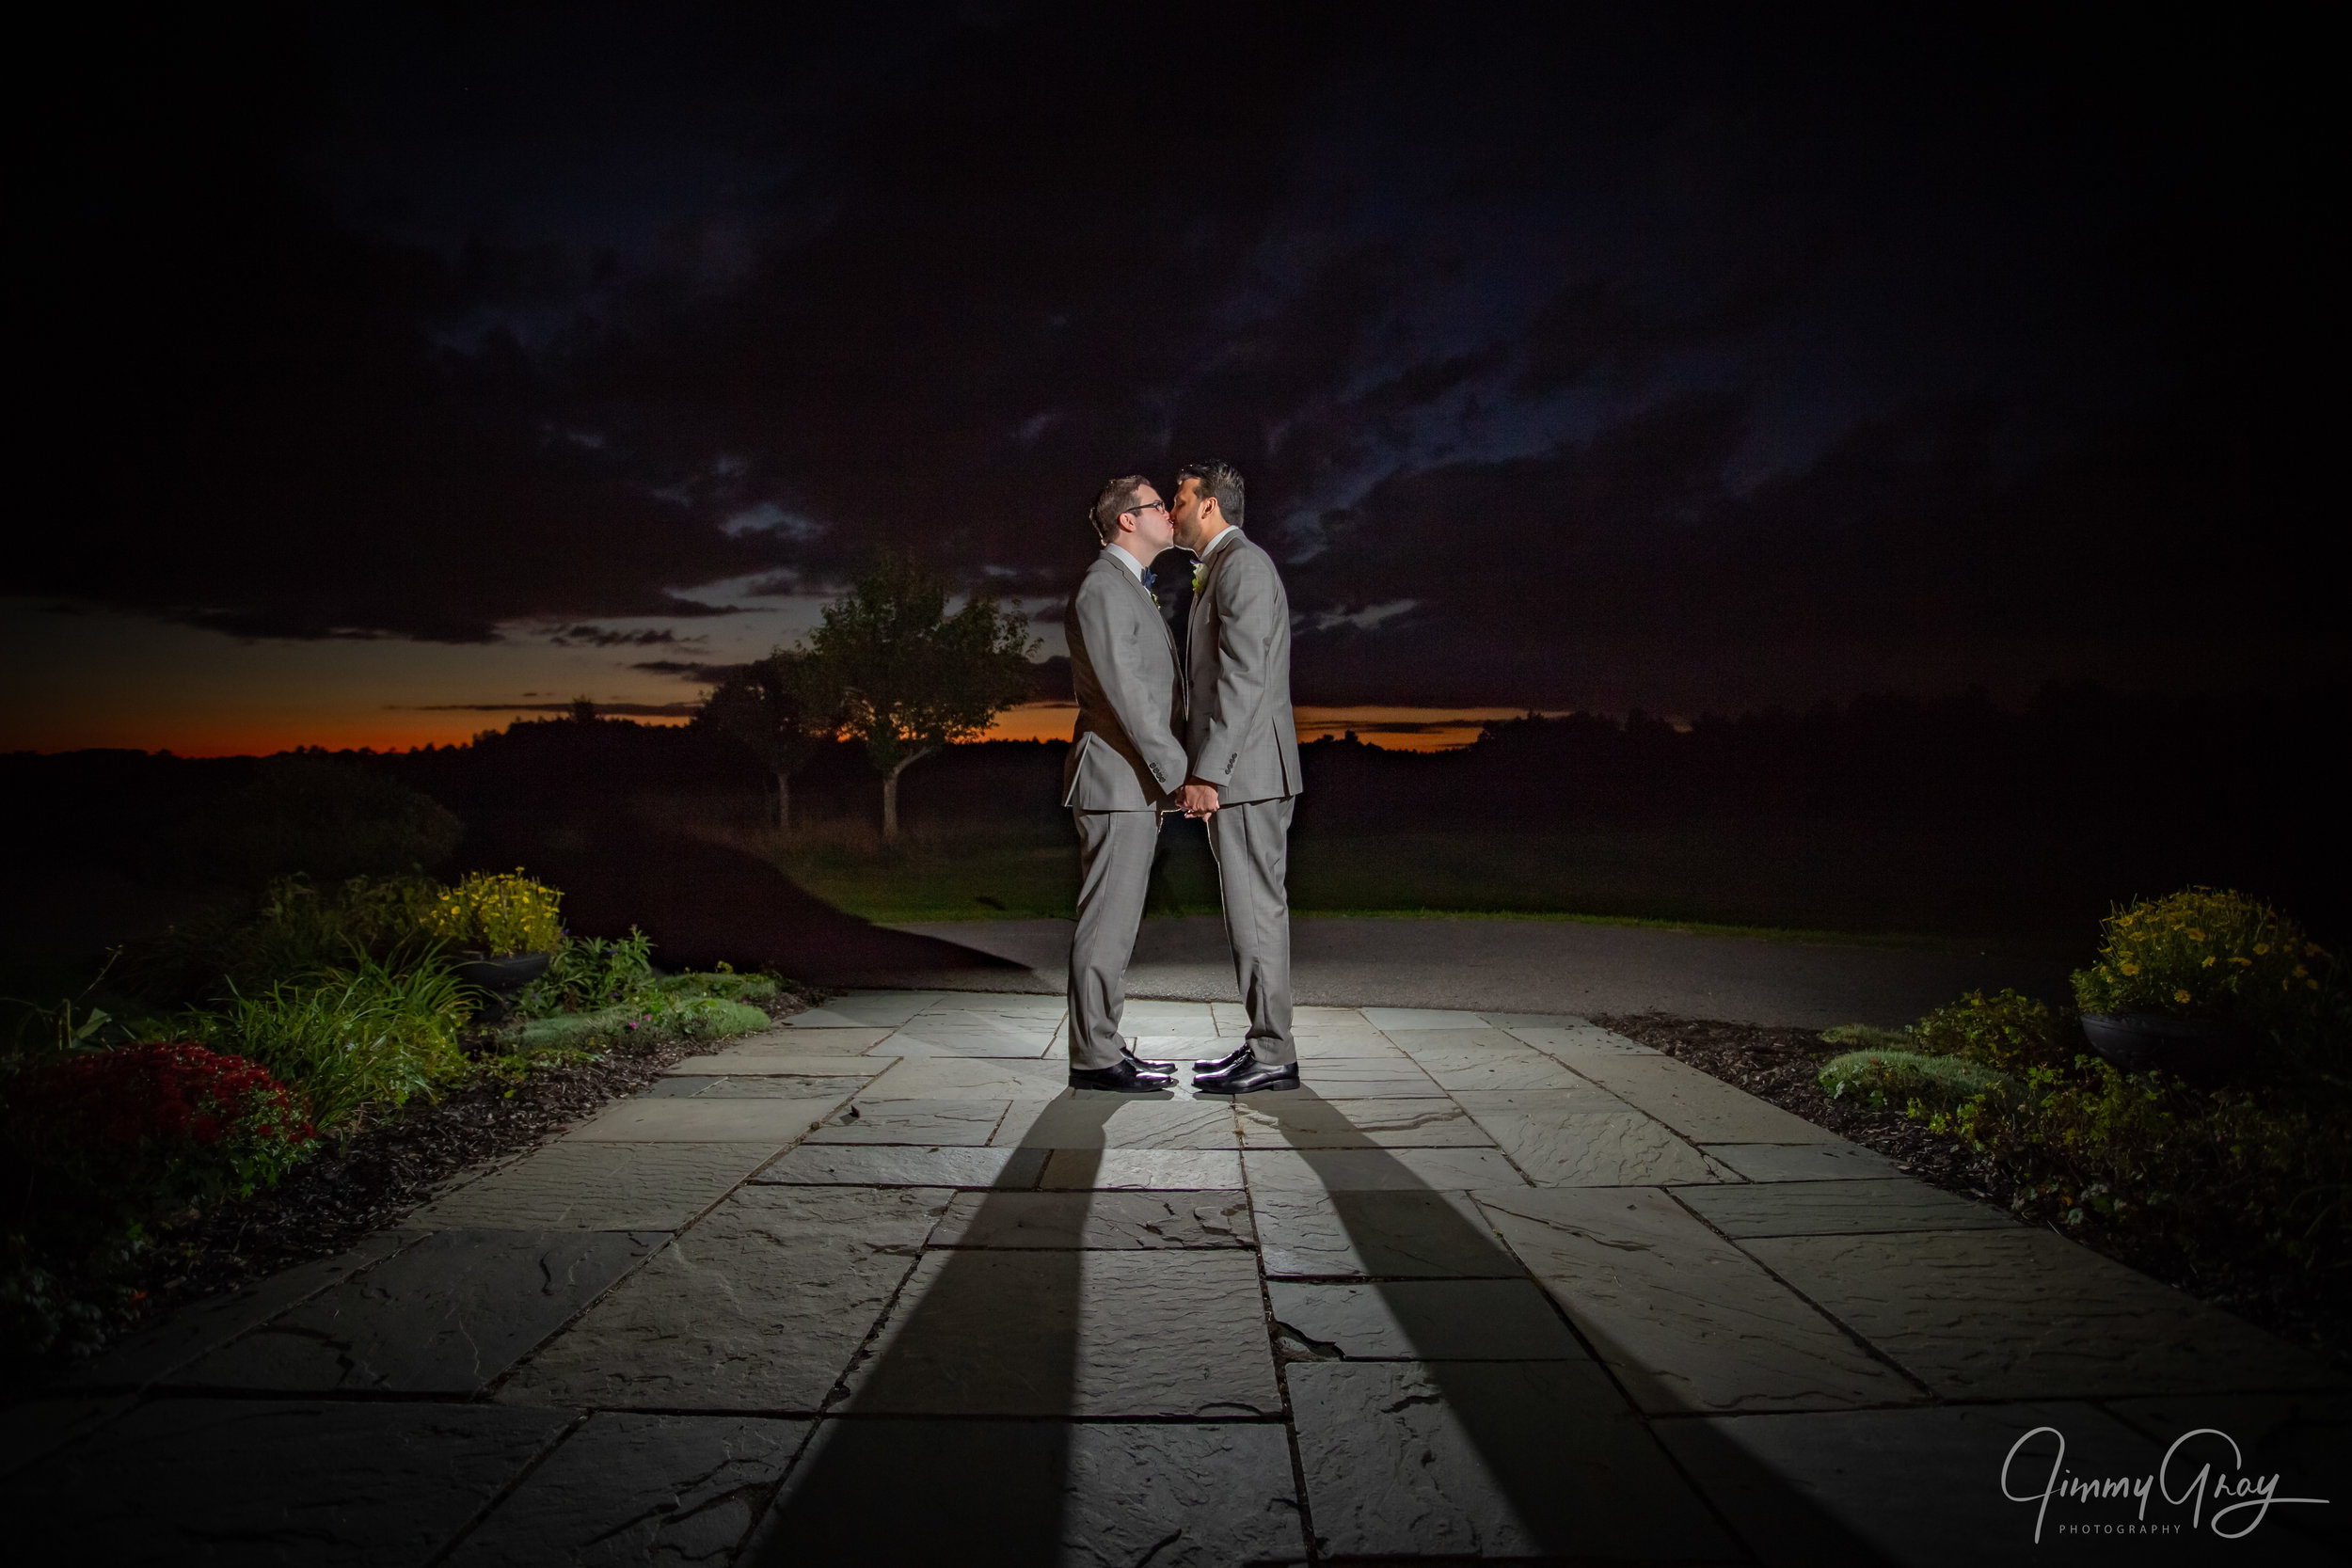 MA Wedding Photography - Jimmy Gray Photo - Lakeville, MA - LeBaron Hills Country Club - Shot For Kady Provost Photography